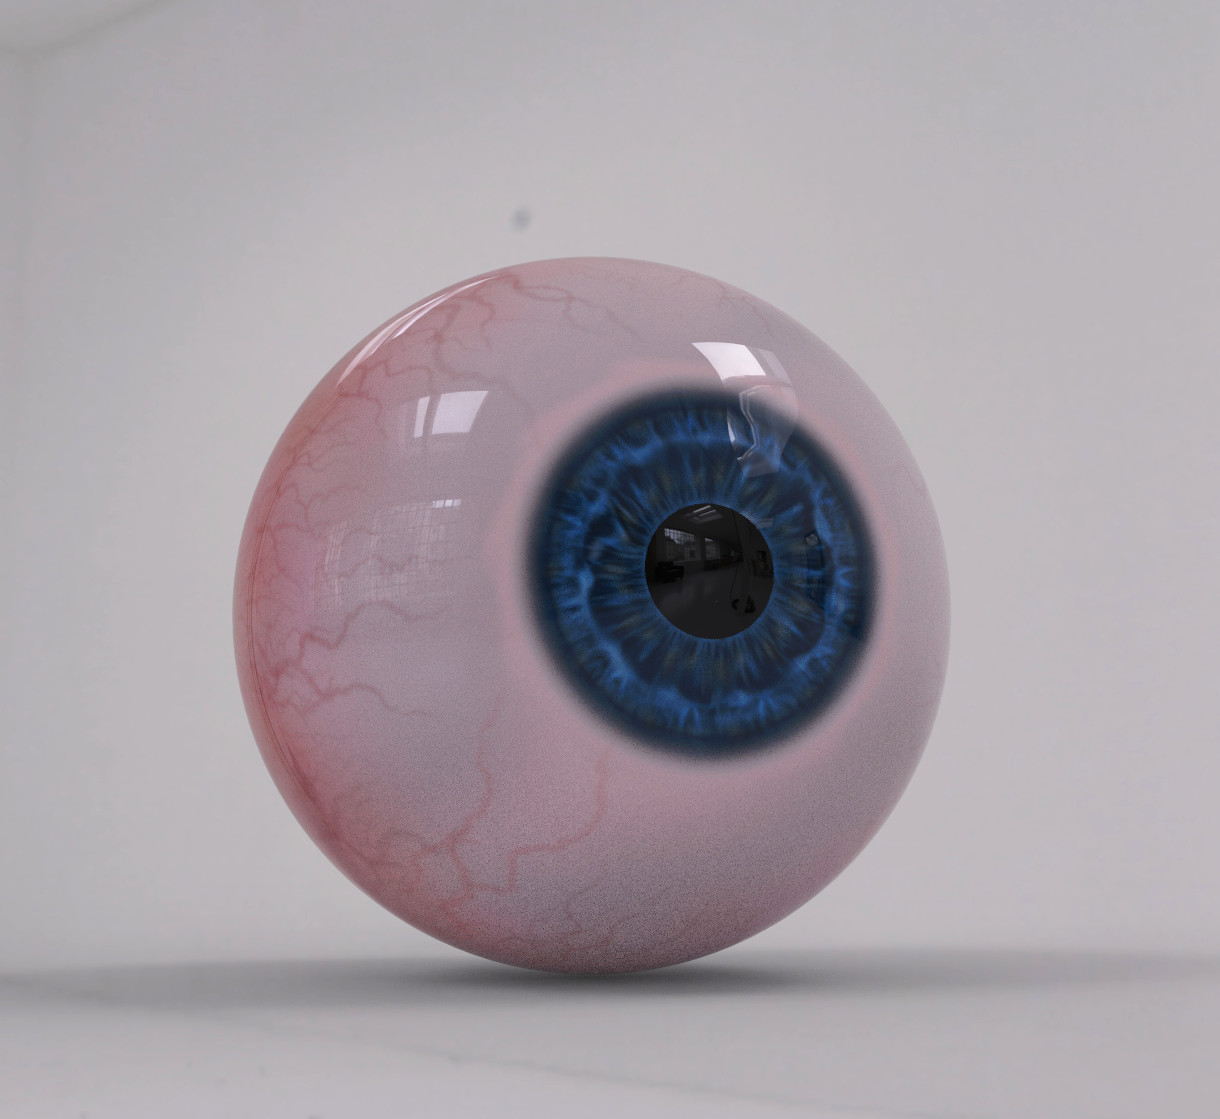 Eyeball's first photoshoot